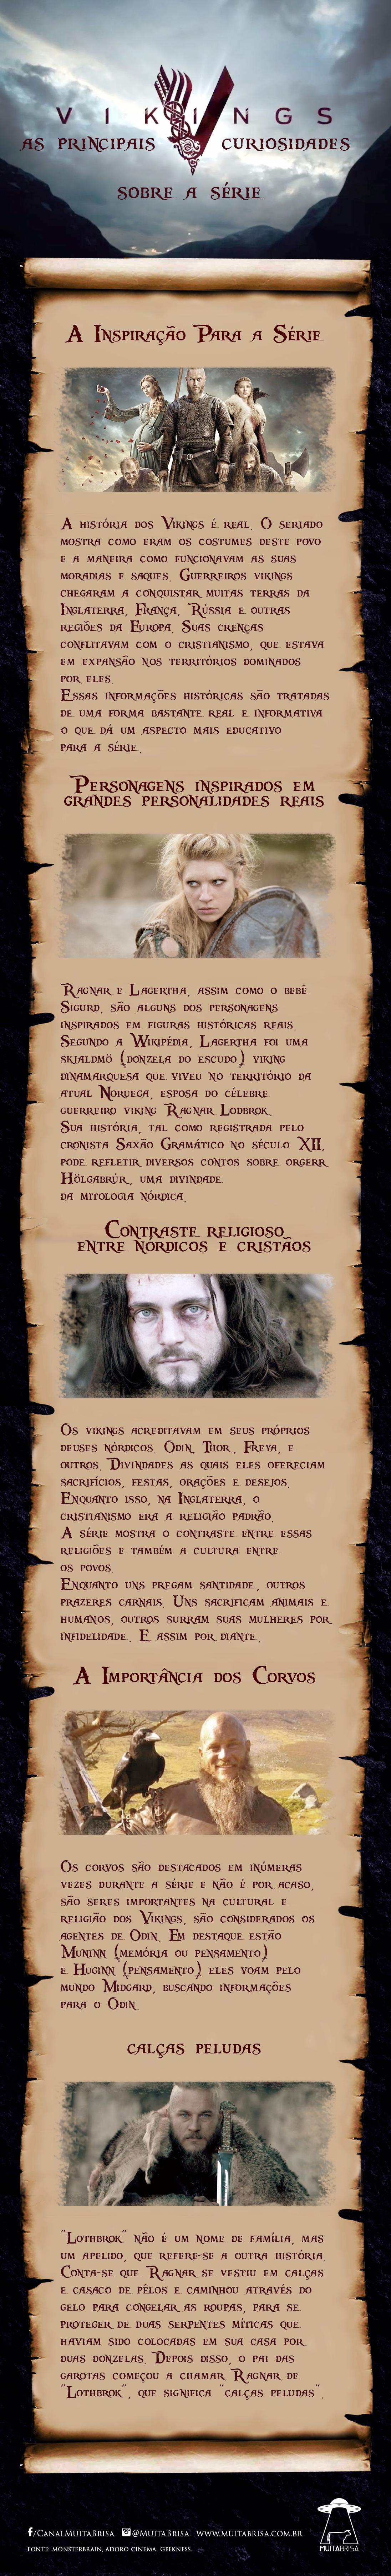 info_vikings